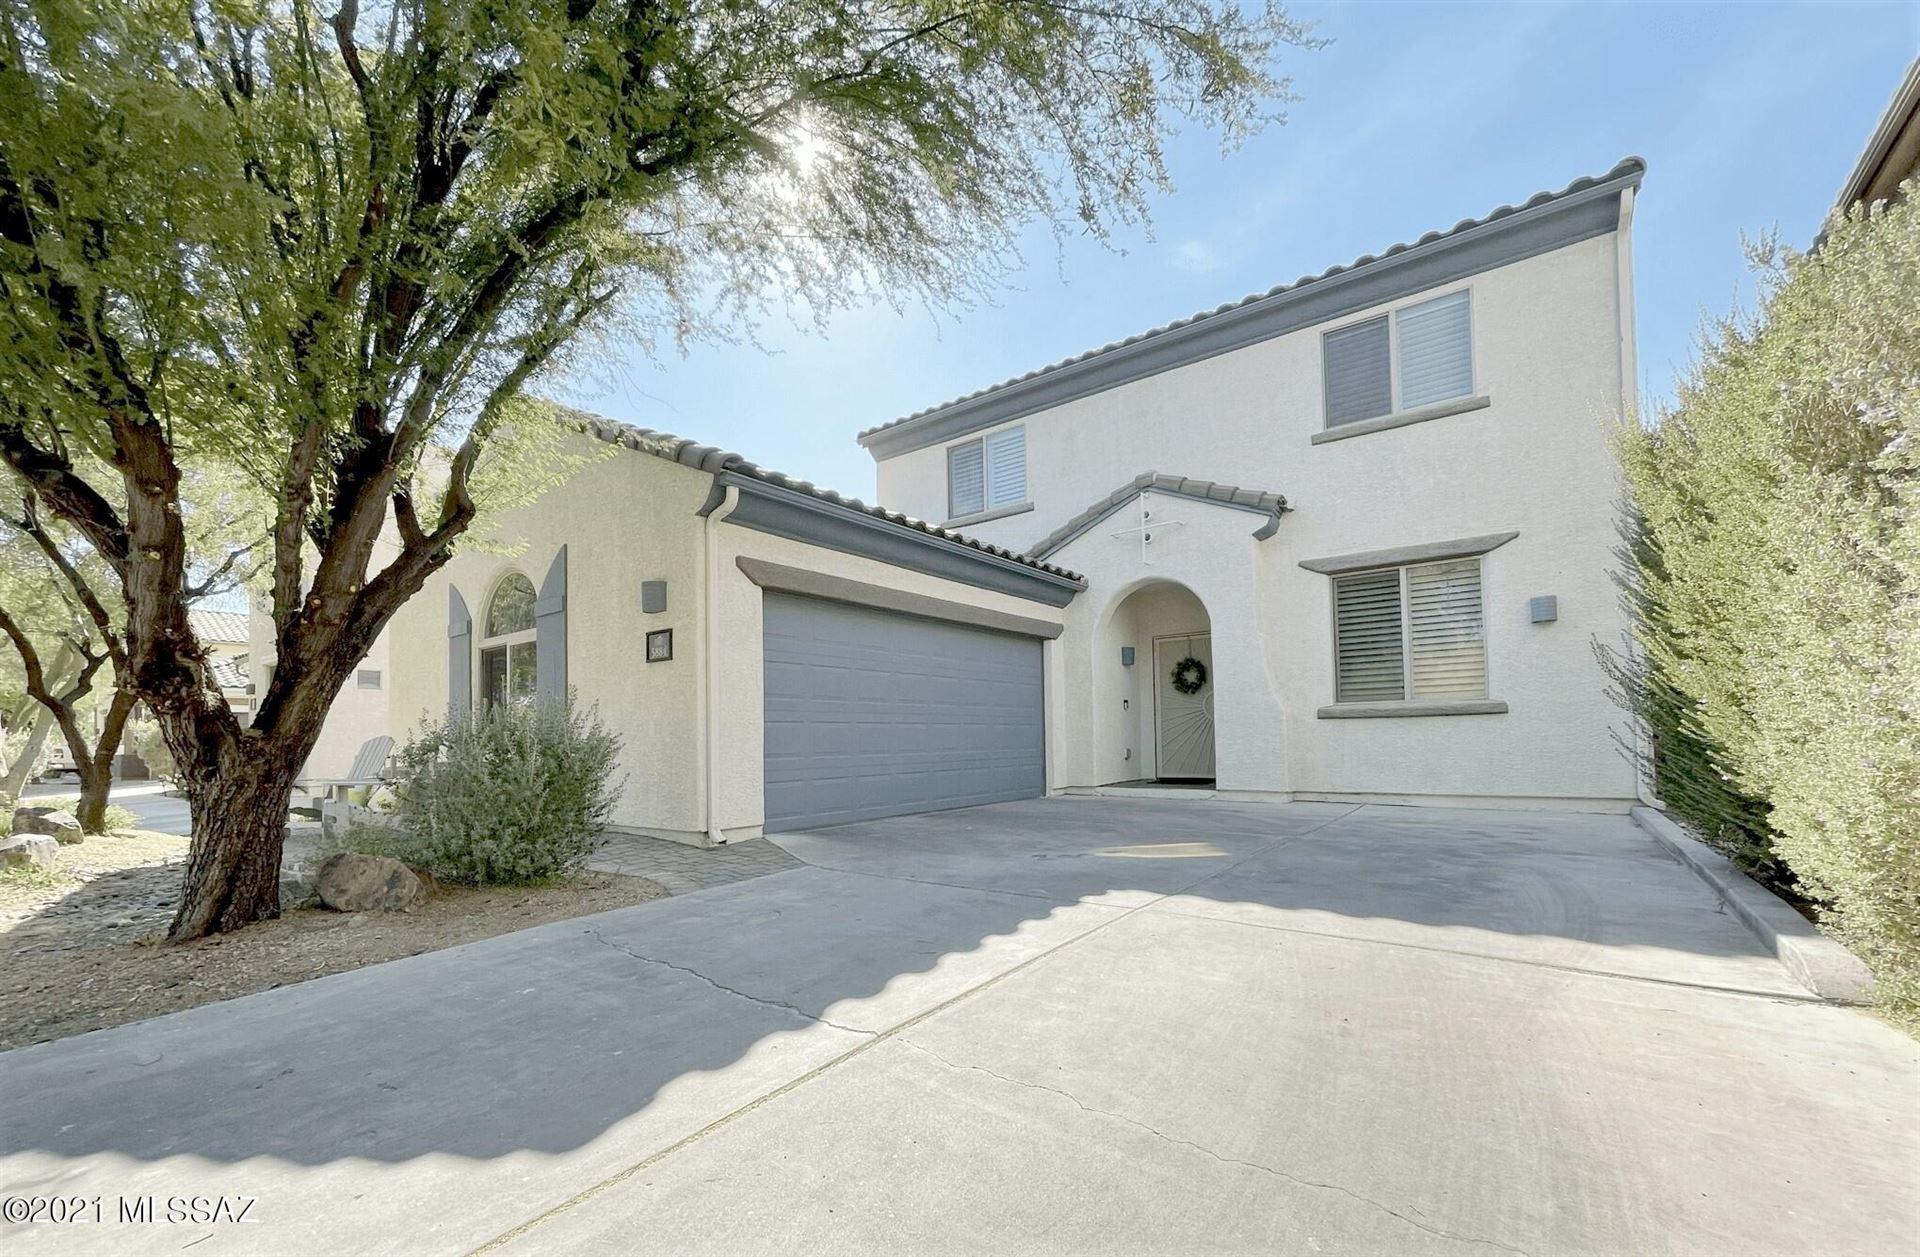 5884 S Courtland Drive, Tucson, AZ 85747 - MLS#: 22114684